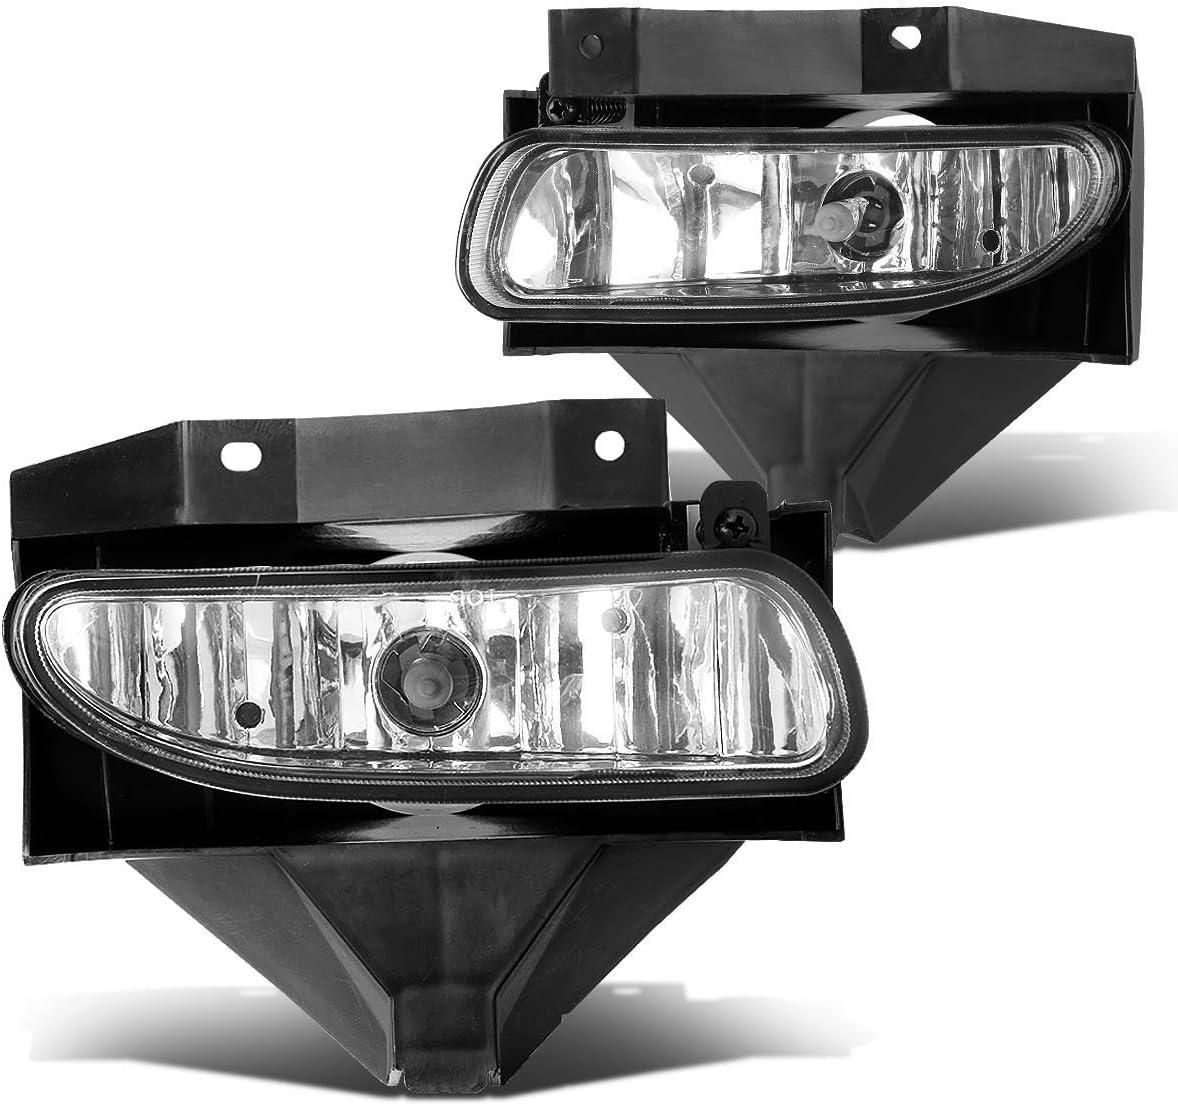 DNA MOTORING FL-ZTL-115-AM Front Bumper Fog Light